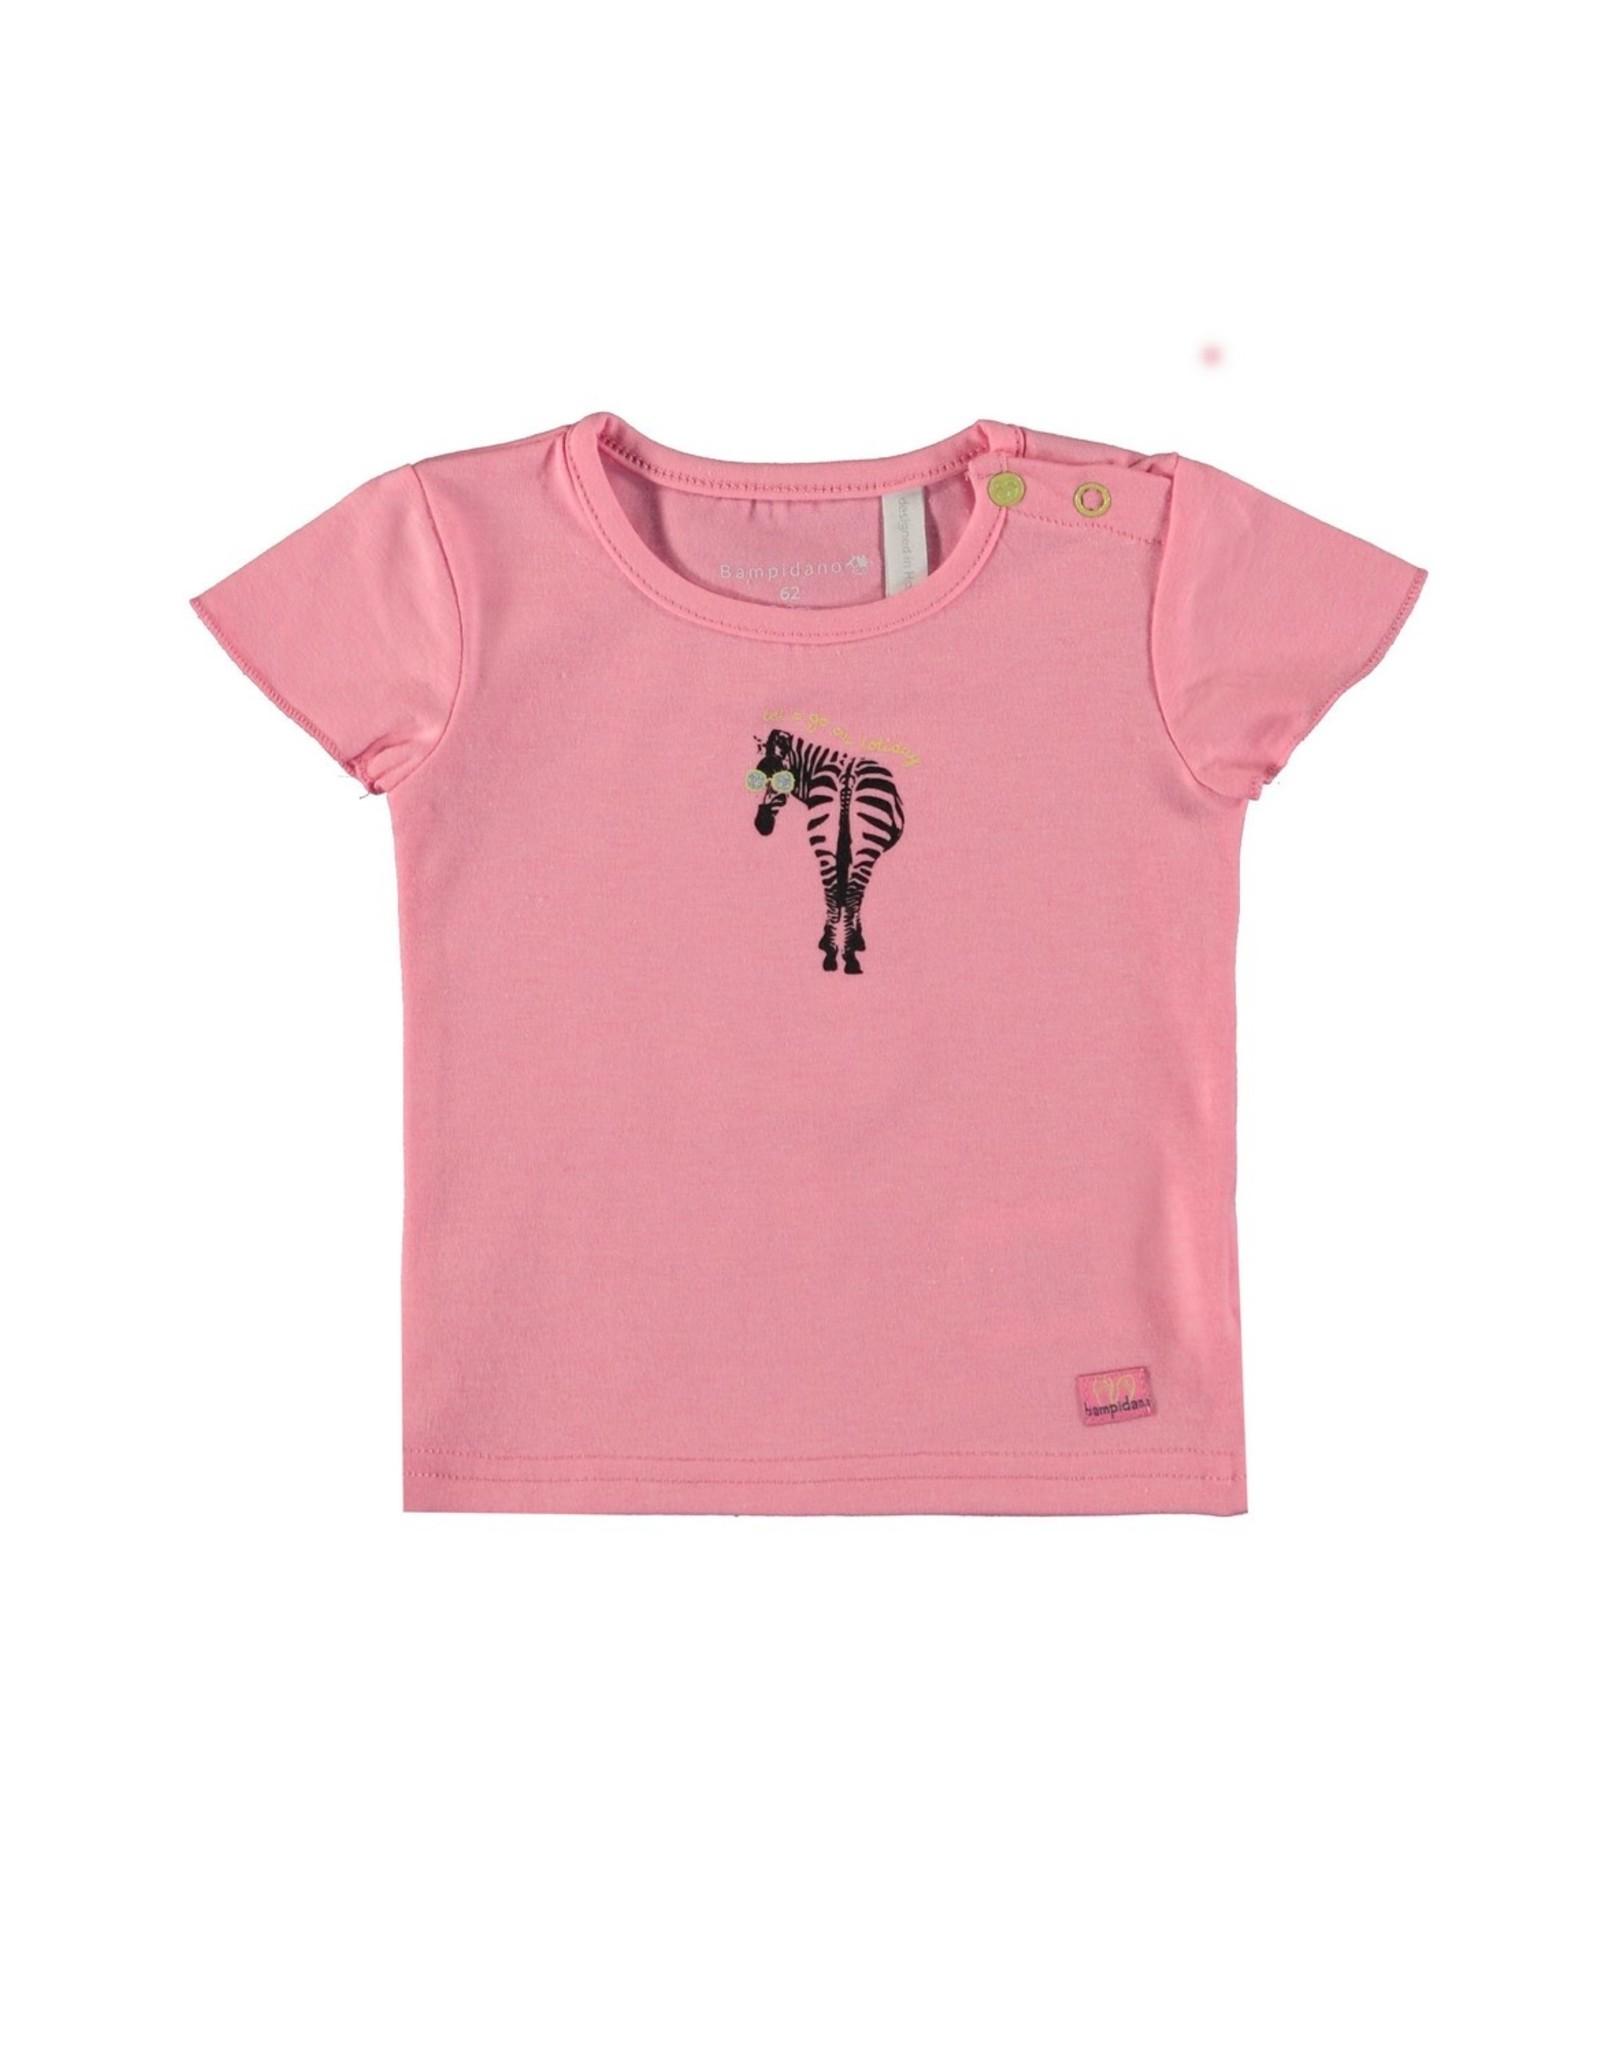 Bampidano Baby Girls T-shirt fancy s/s plain ZEBRA, pink